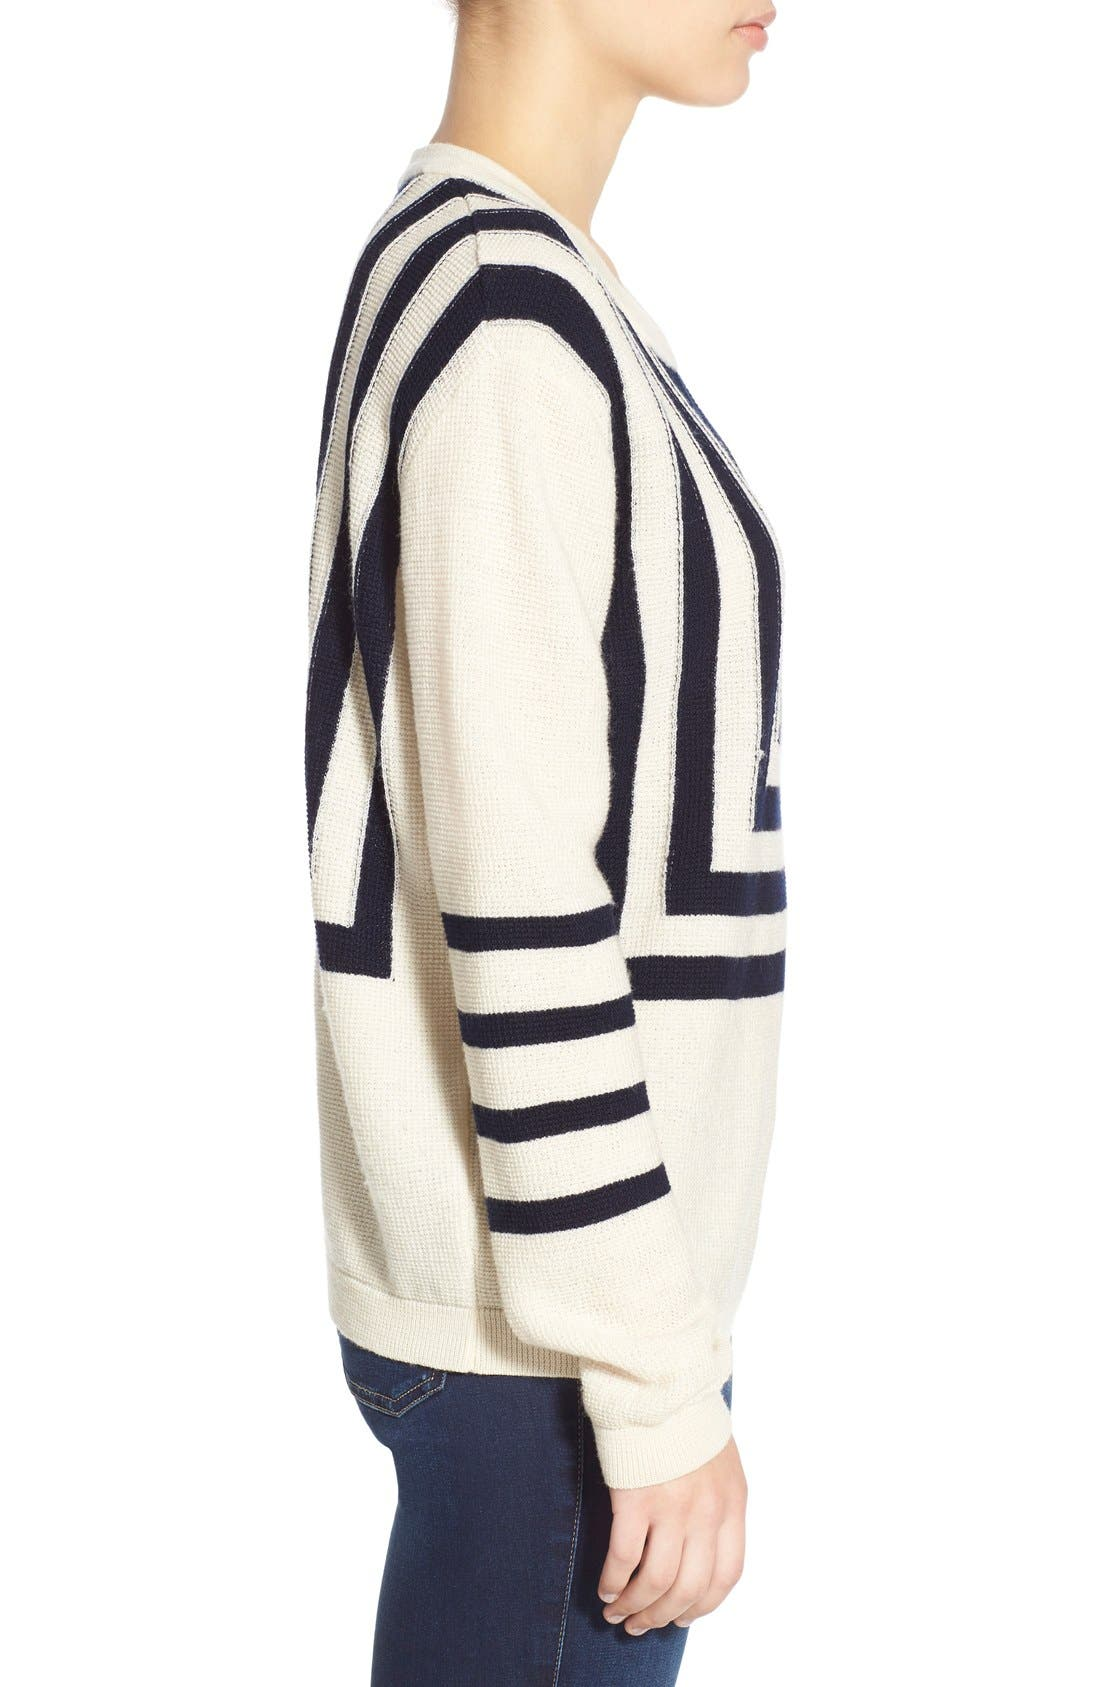 Alternate Image 3  - M.i.h. Jeans 'Bib Breton' Crewneck Sweater